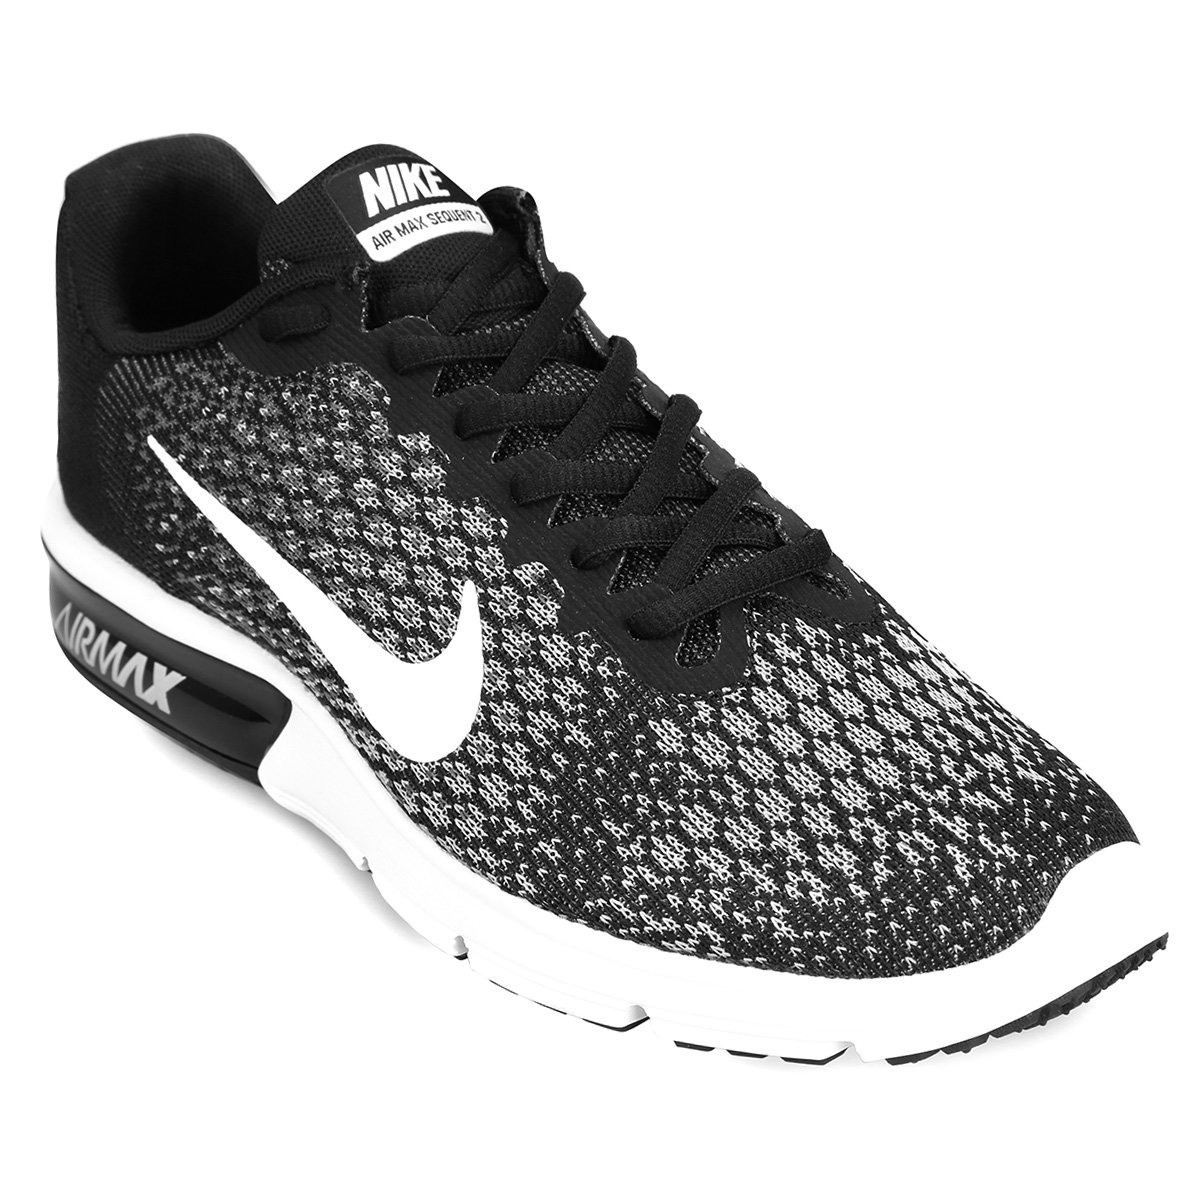 b94c9e27b50 Nike Zapatillas Descuento Negro Sequent 2 Air Preg Max dvPrxvU